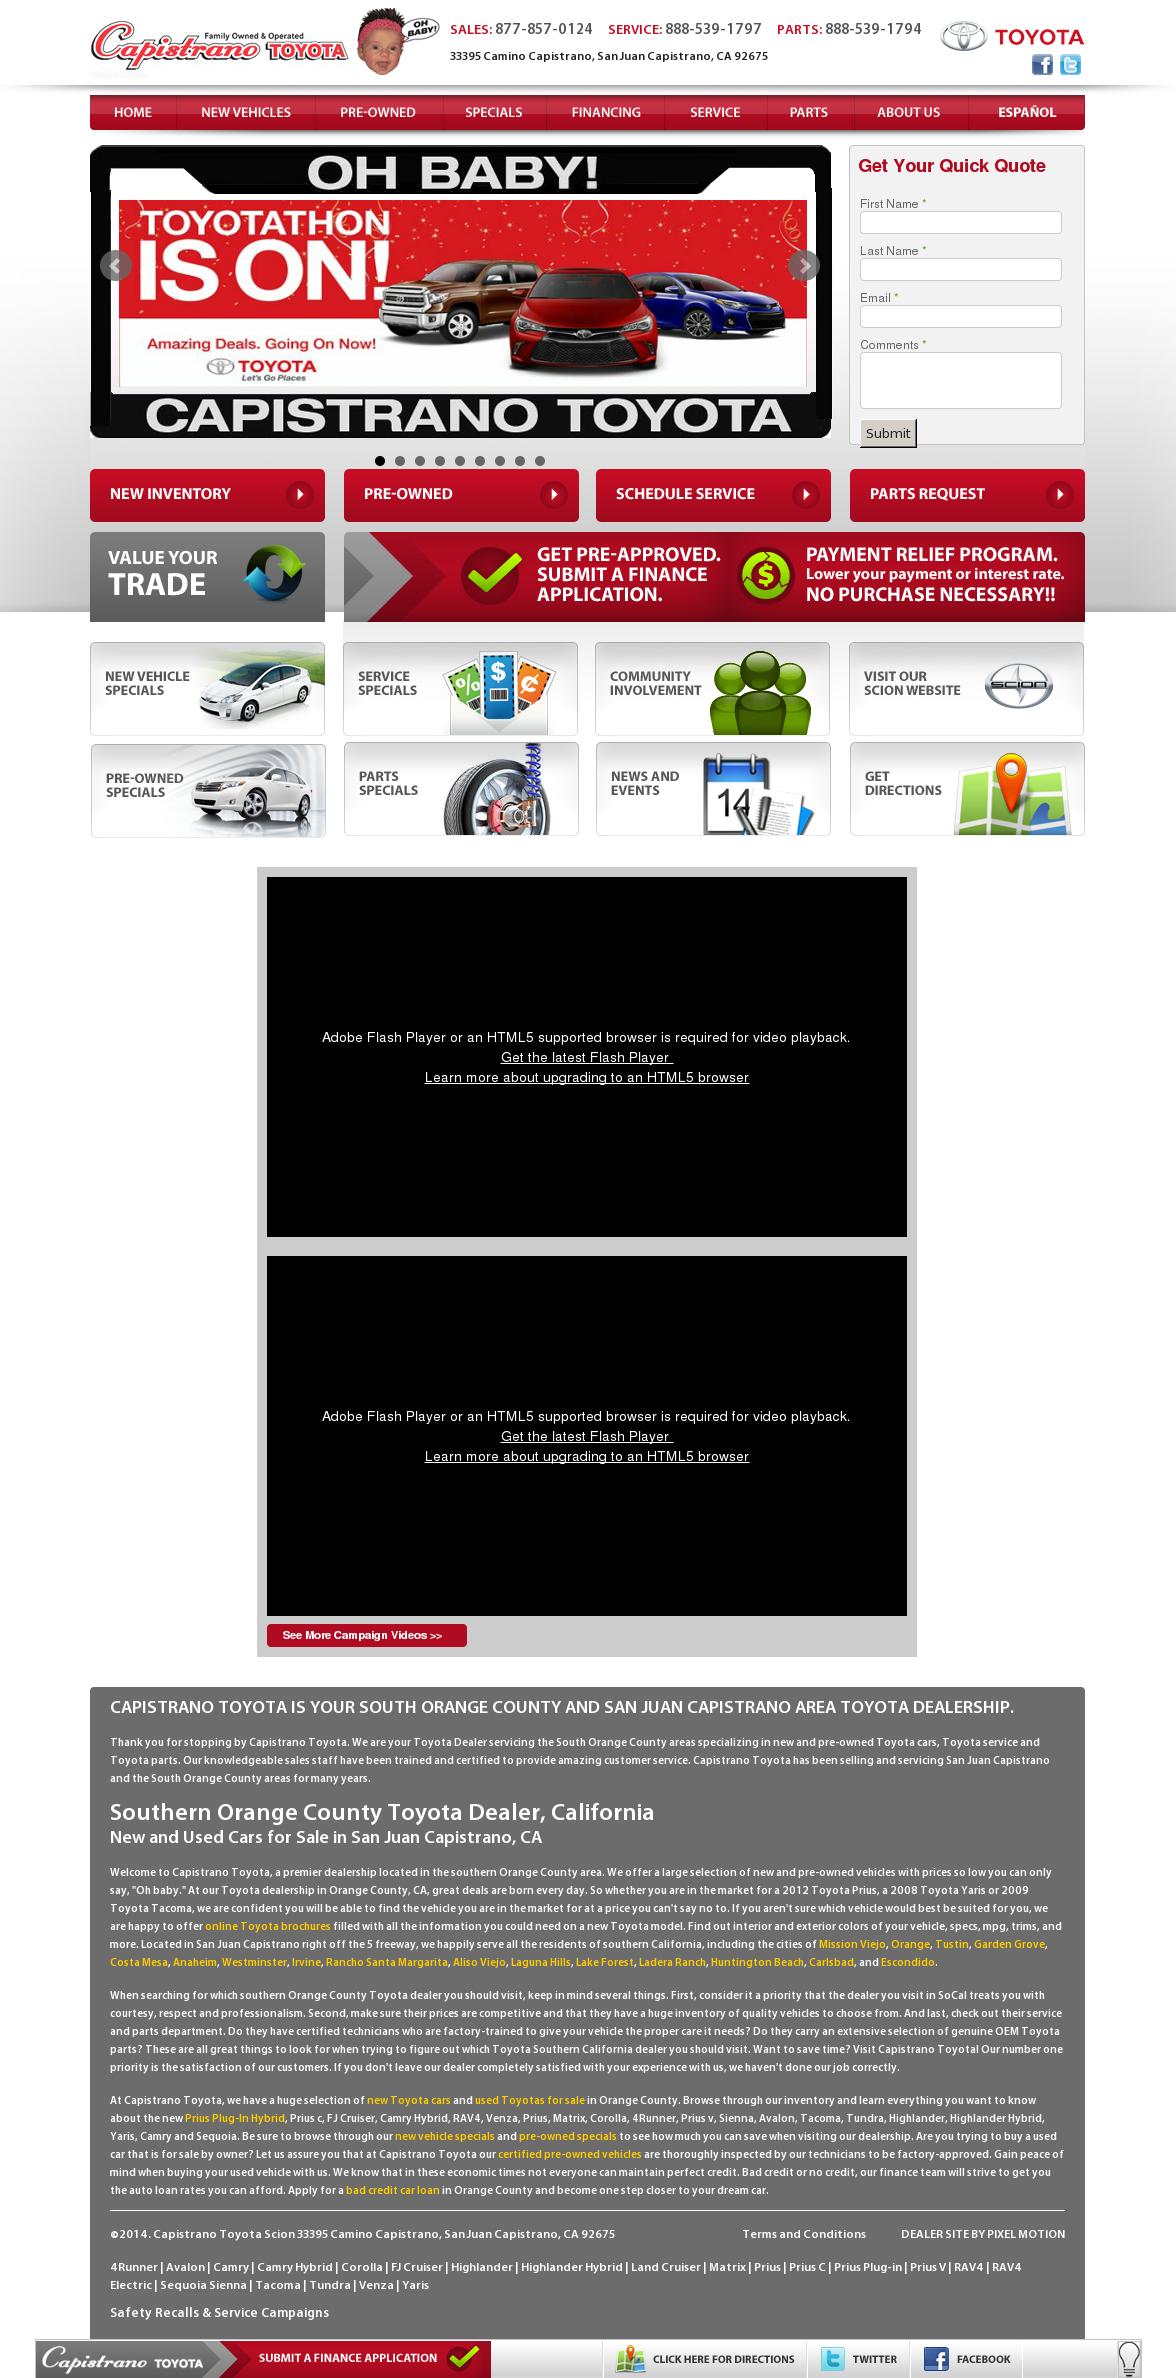 Capistrano Toyota Competitors, Revenue And Employees   Owler Company Profile